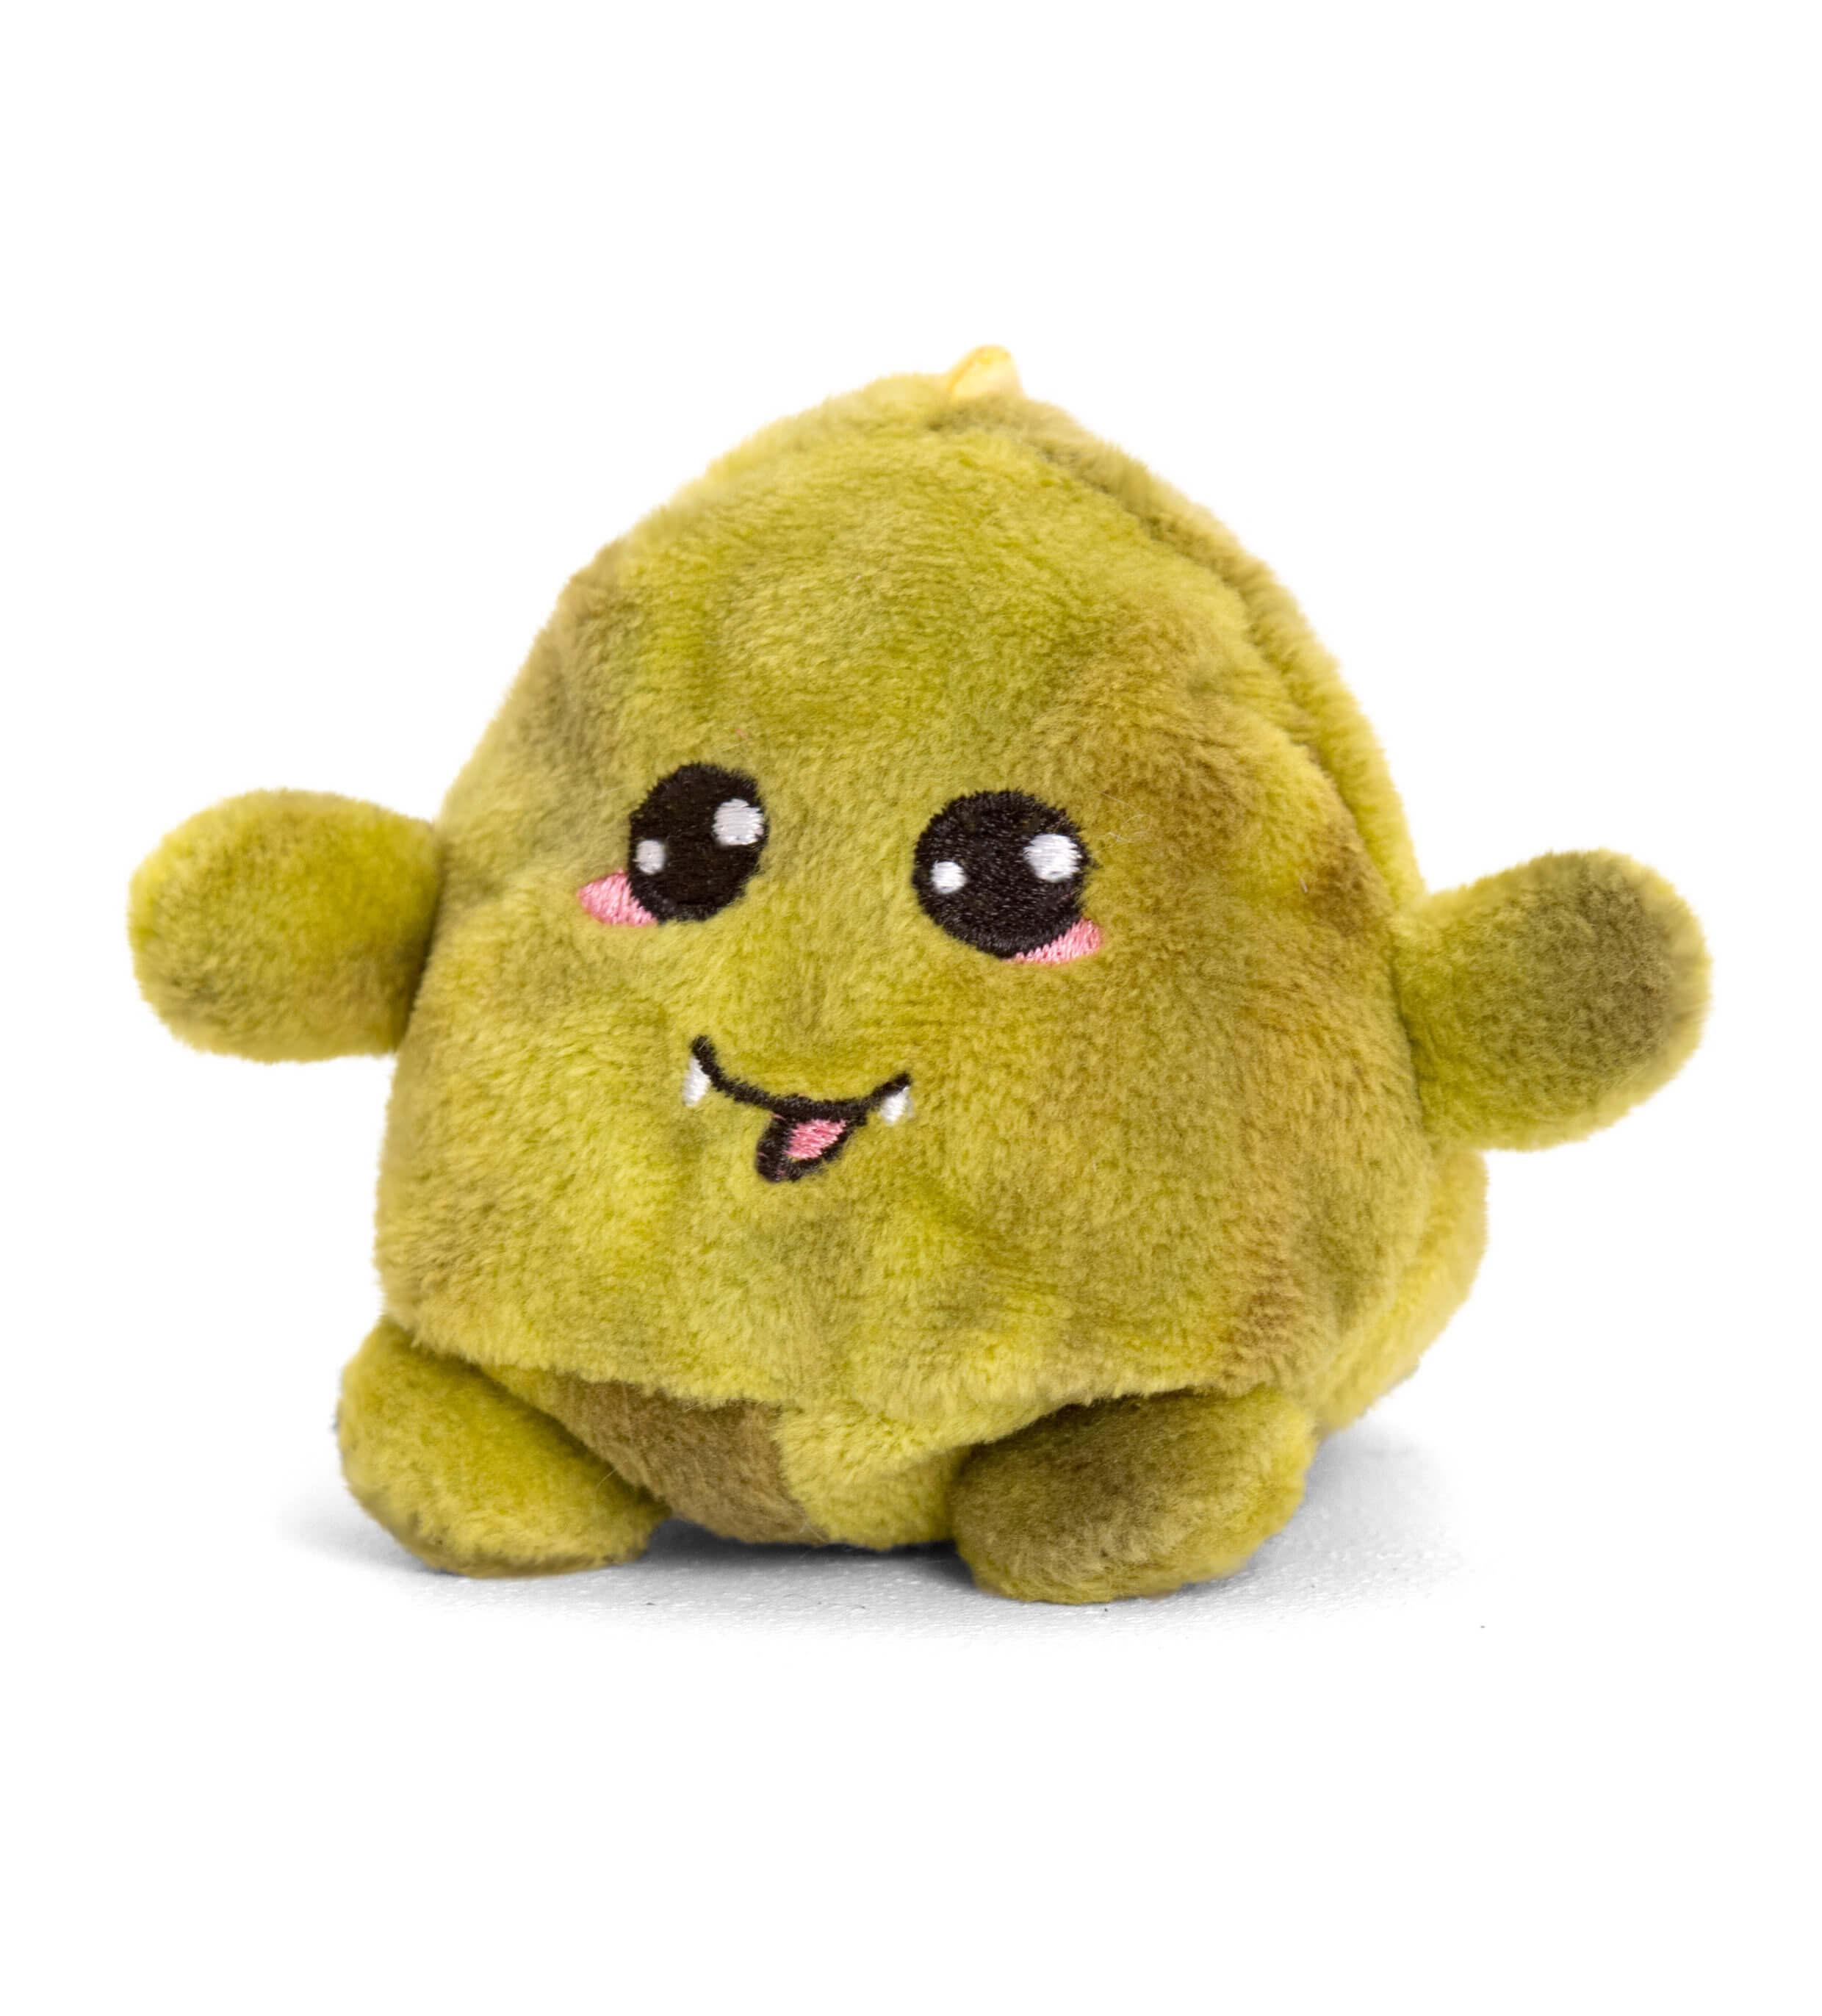 you will recieve one random Bobball Keel Roys Bobballs soft toy